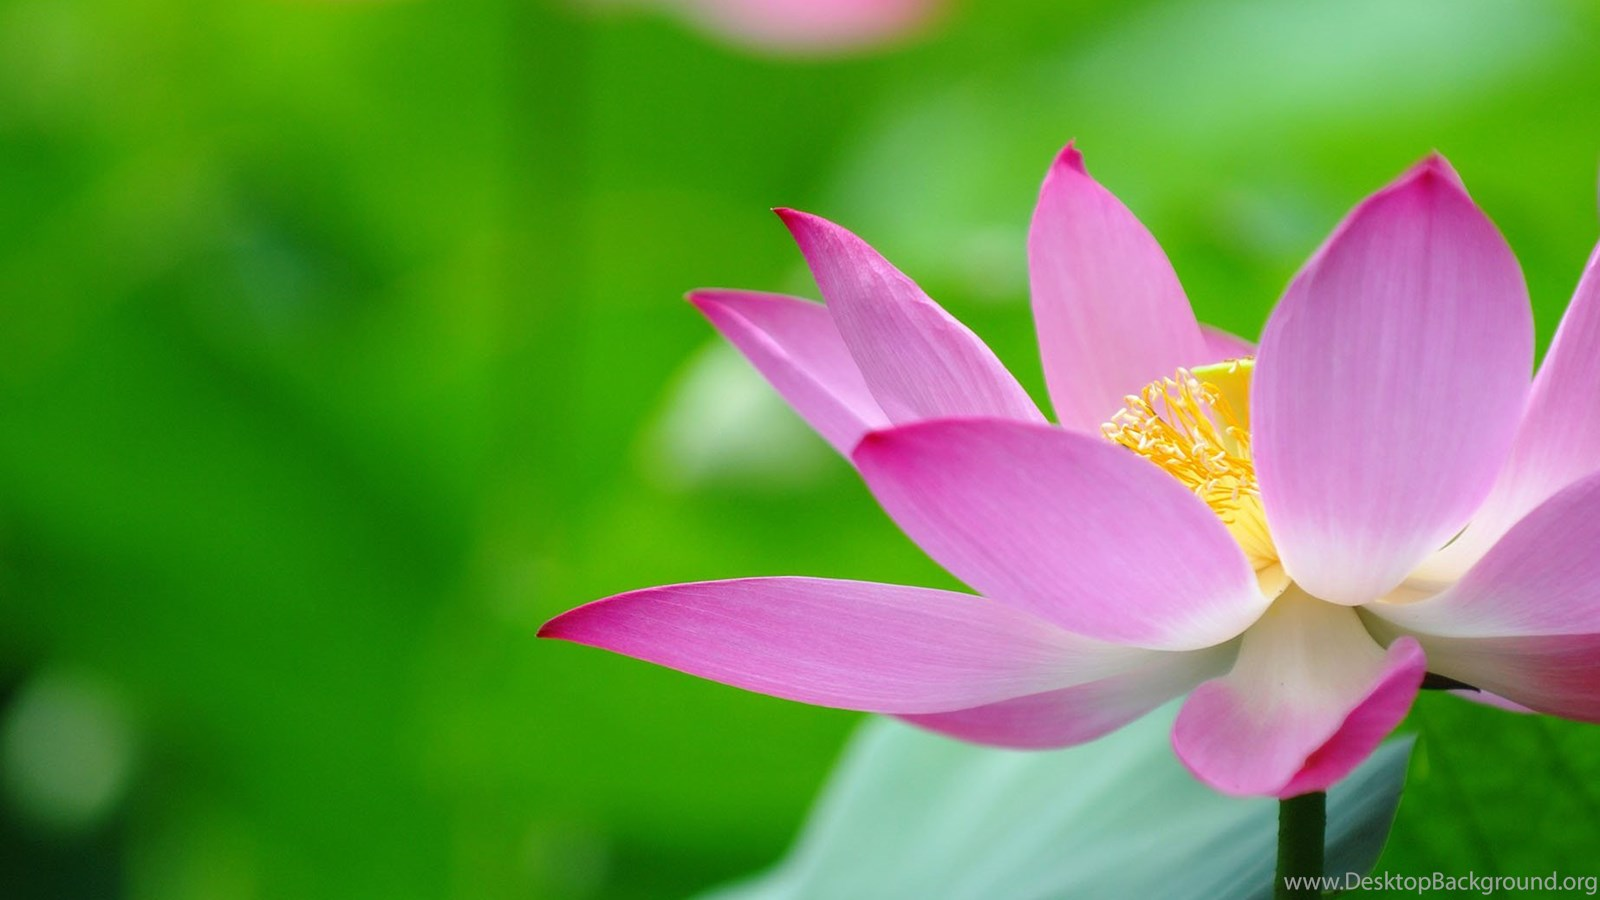 Beautiful Lotus Flowers Wallpapers 438 Lotus Flower Pictures